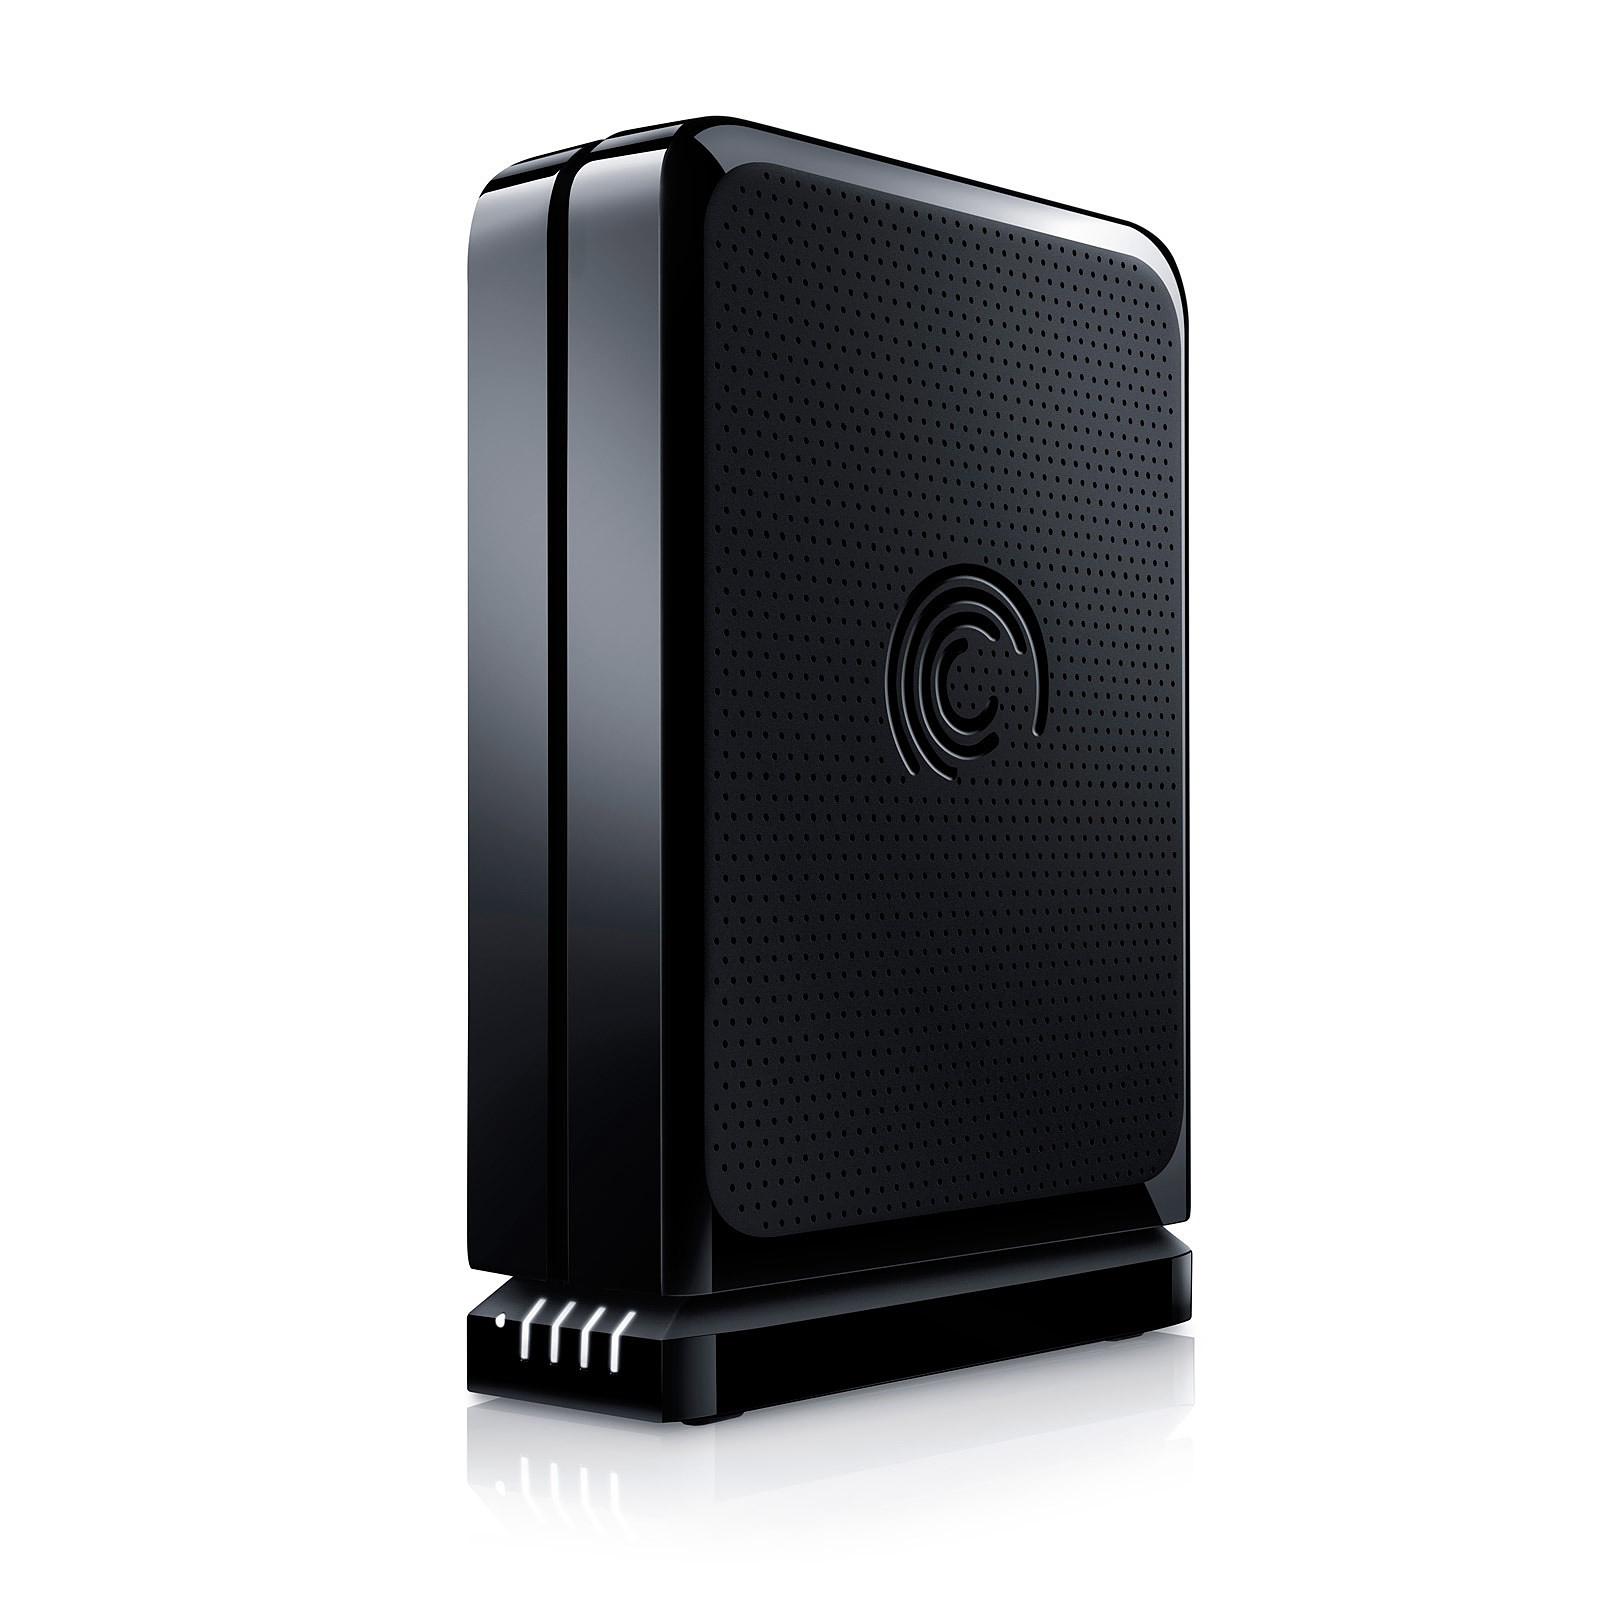 Seagate FreeAgent GoFlex Desk 1 To Noir (USB 2.0)